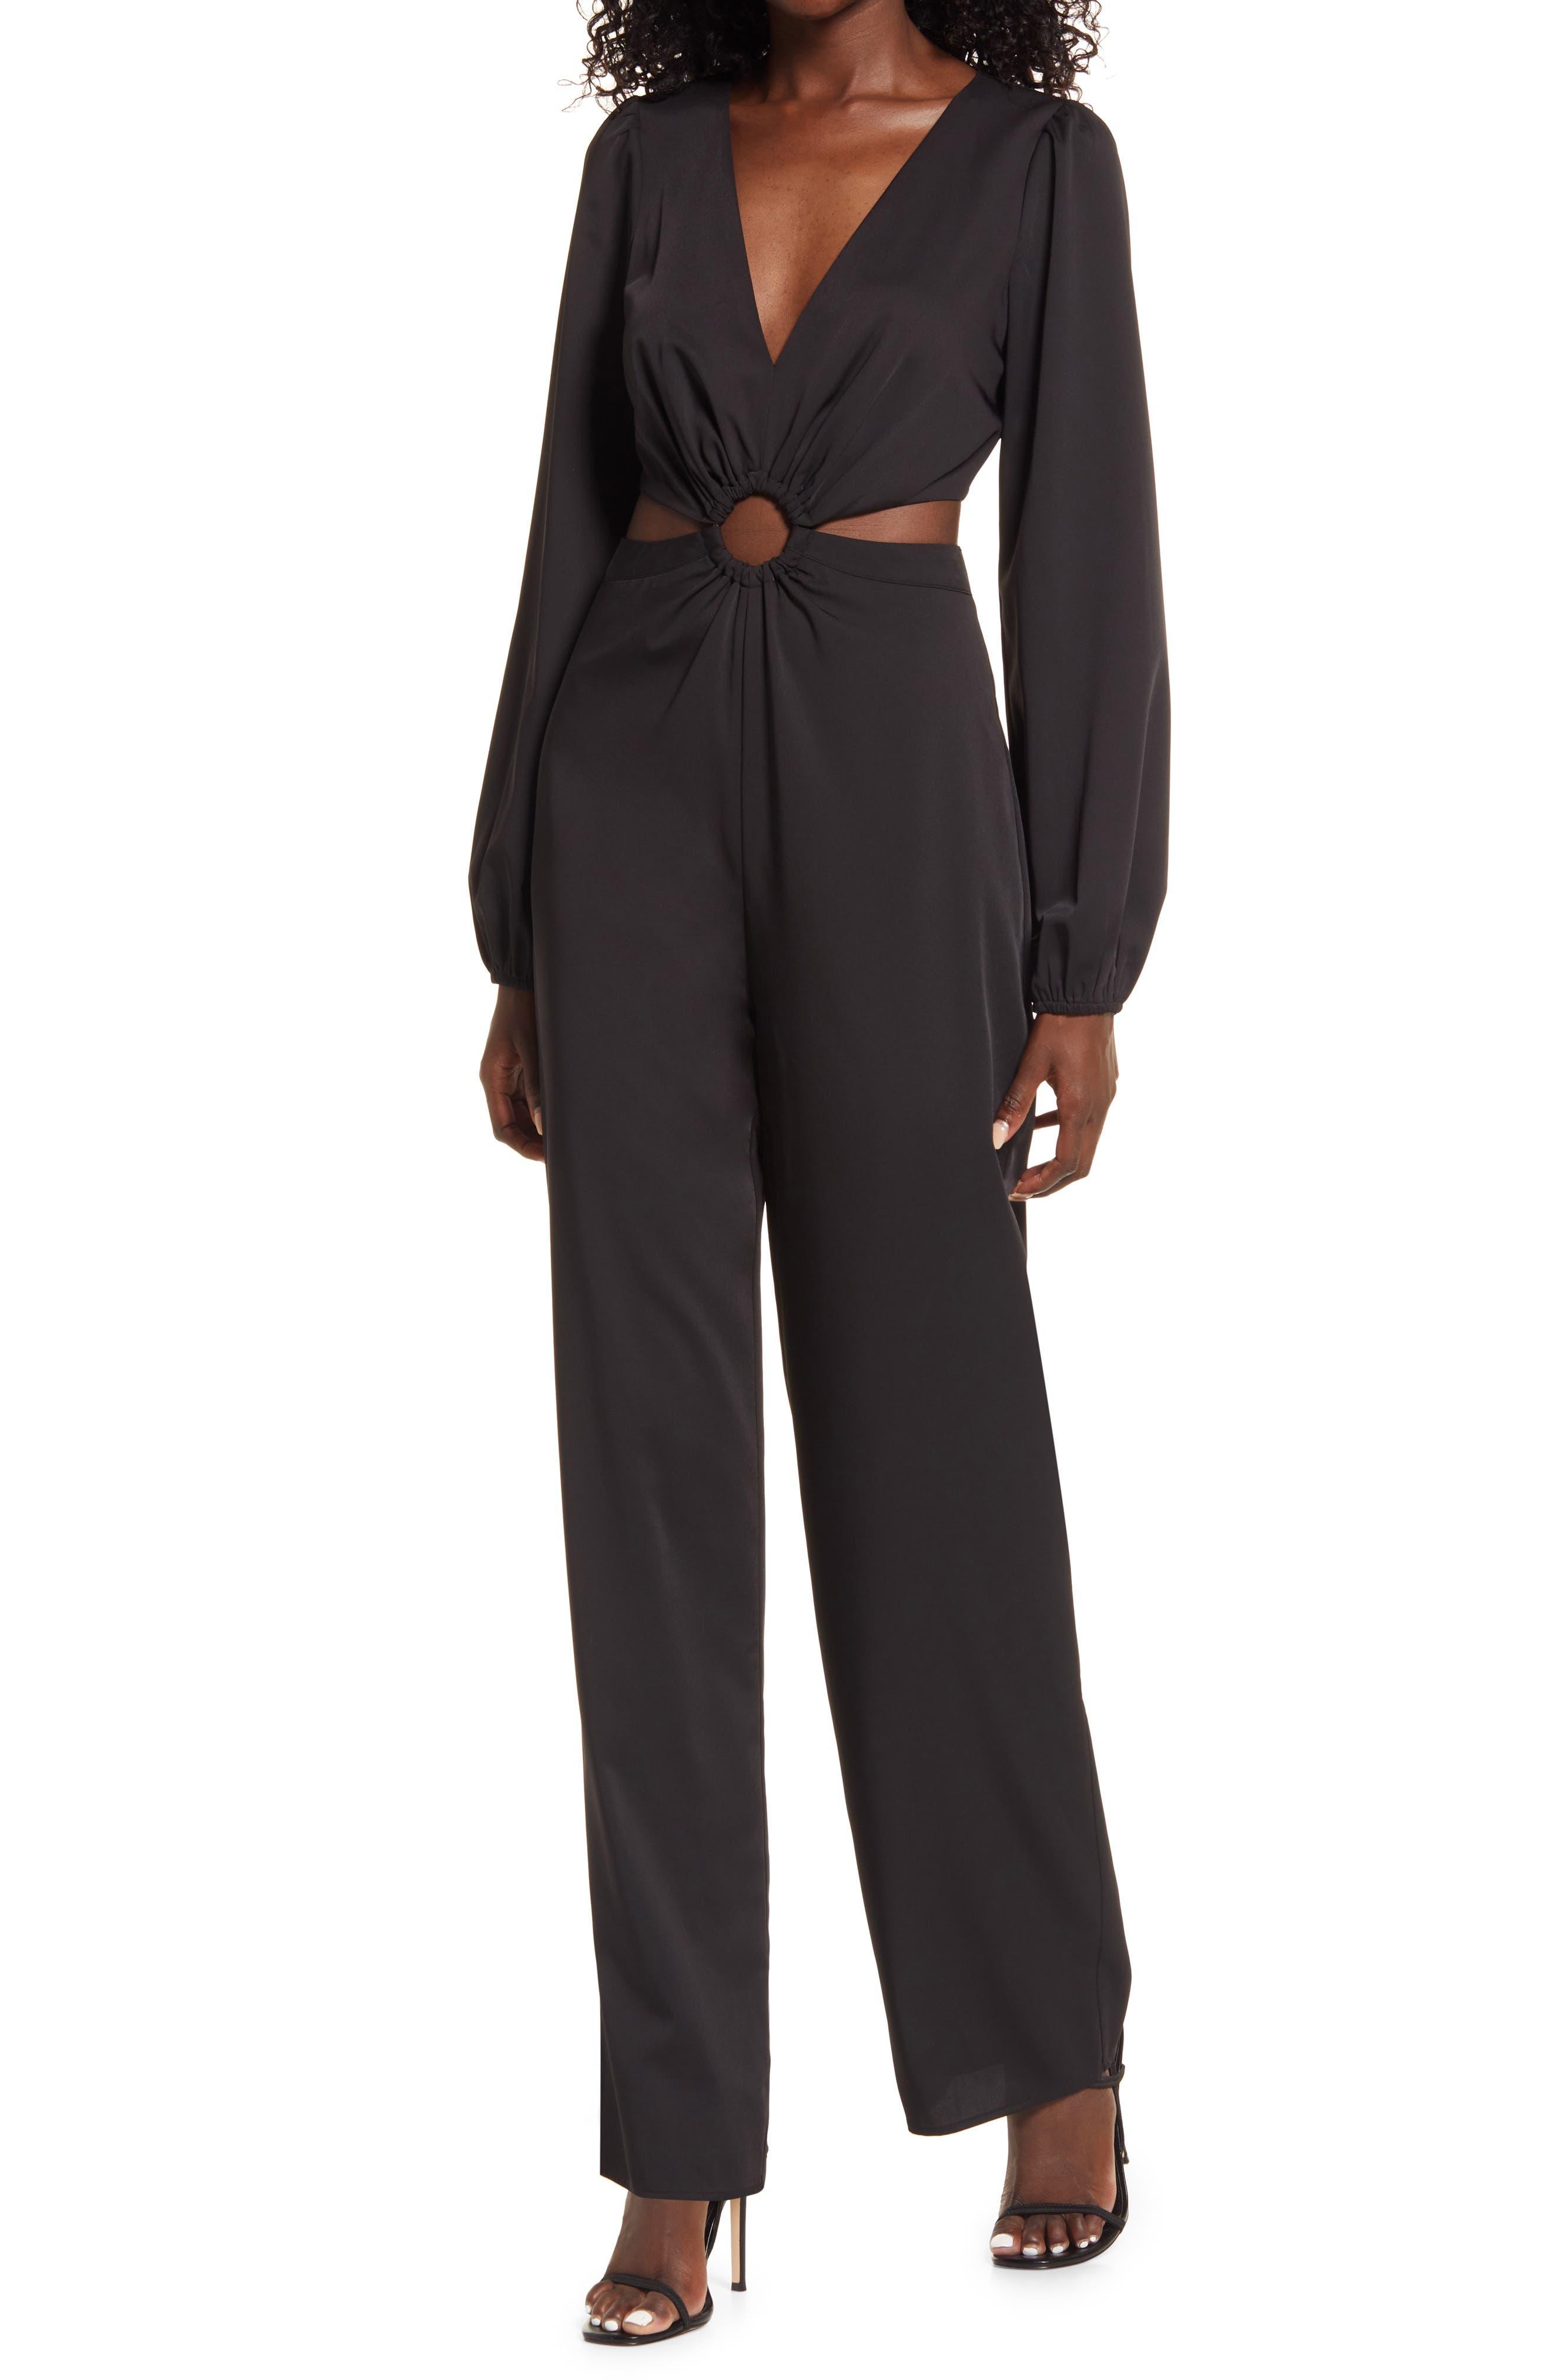 70s Jumpsuit   Disco Jumpsuits, Sequin Rompers Womens Lulus Vegas Nights Long Sleeve Cutout Jumpsuit Size Small - Black $64.00 AT vintagedancer.com